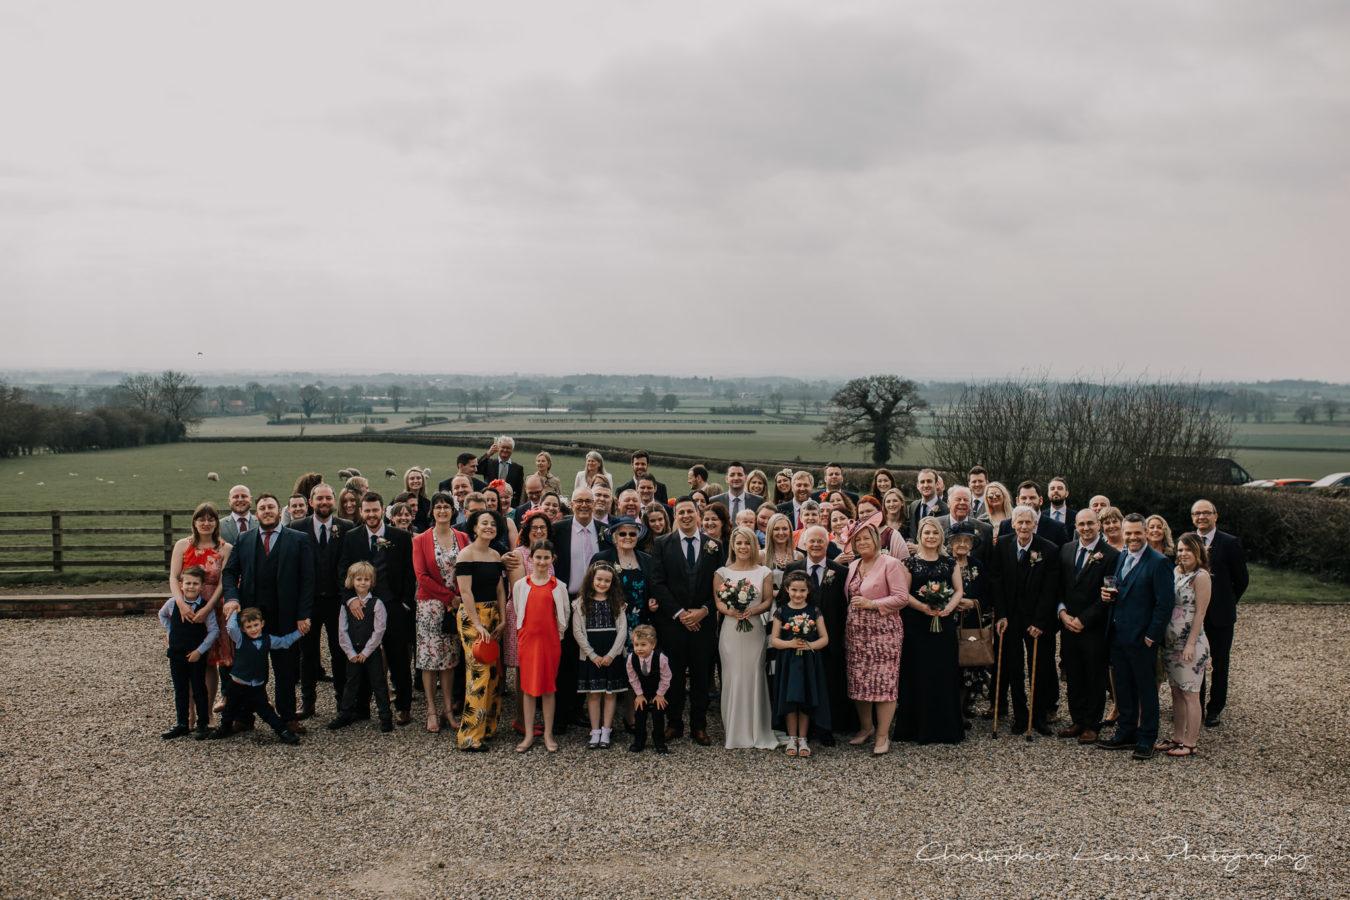 Thief-Hall-Wedding-Christopher-Lewis-Photography-54